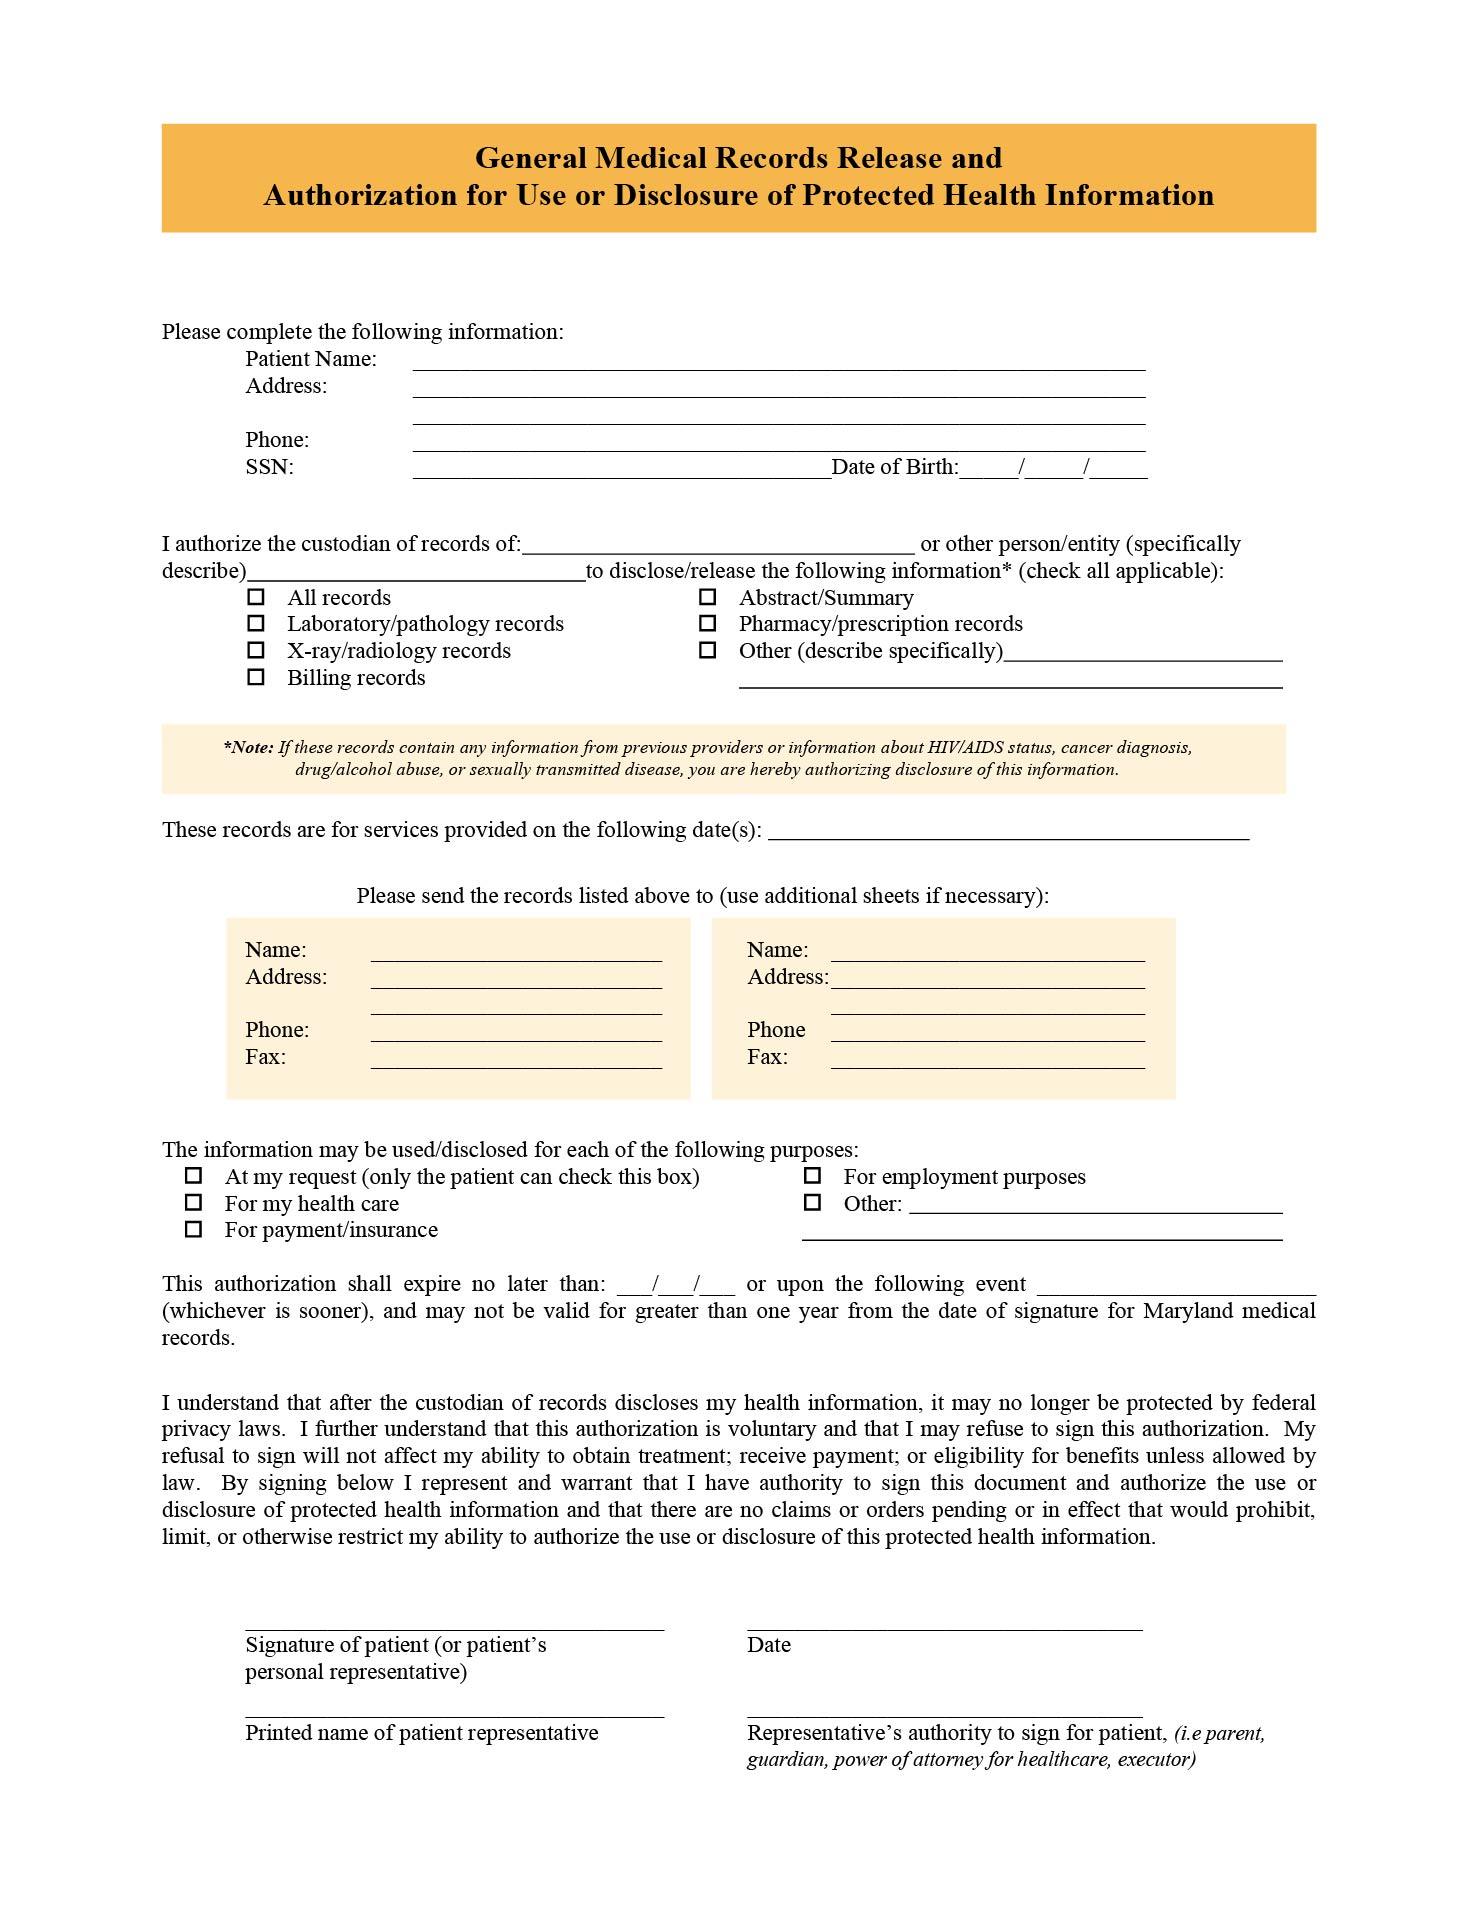 Discharge Form Template hospital discharge form template 9 best – Printable Medical Release Form for Children